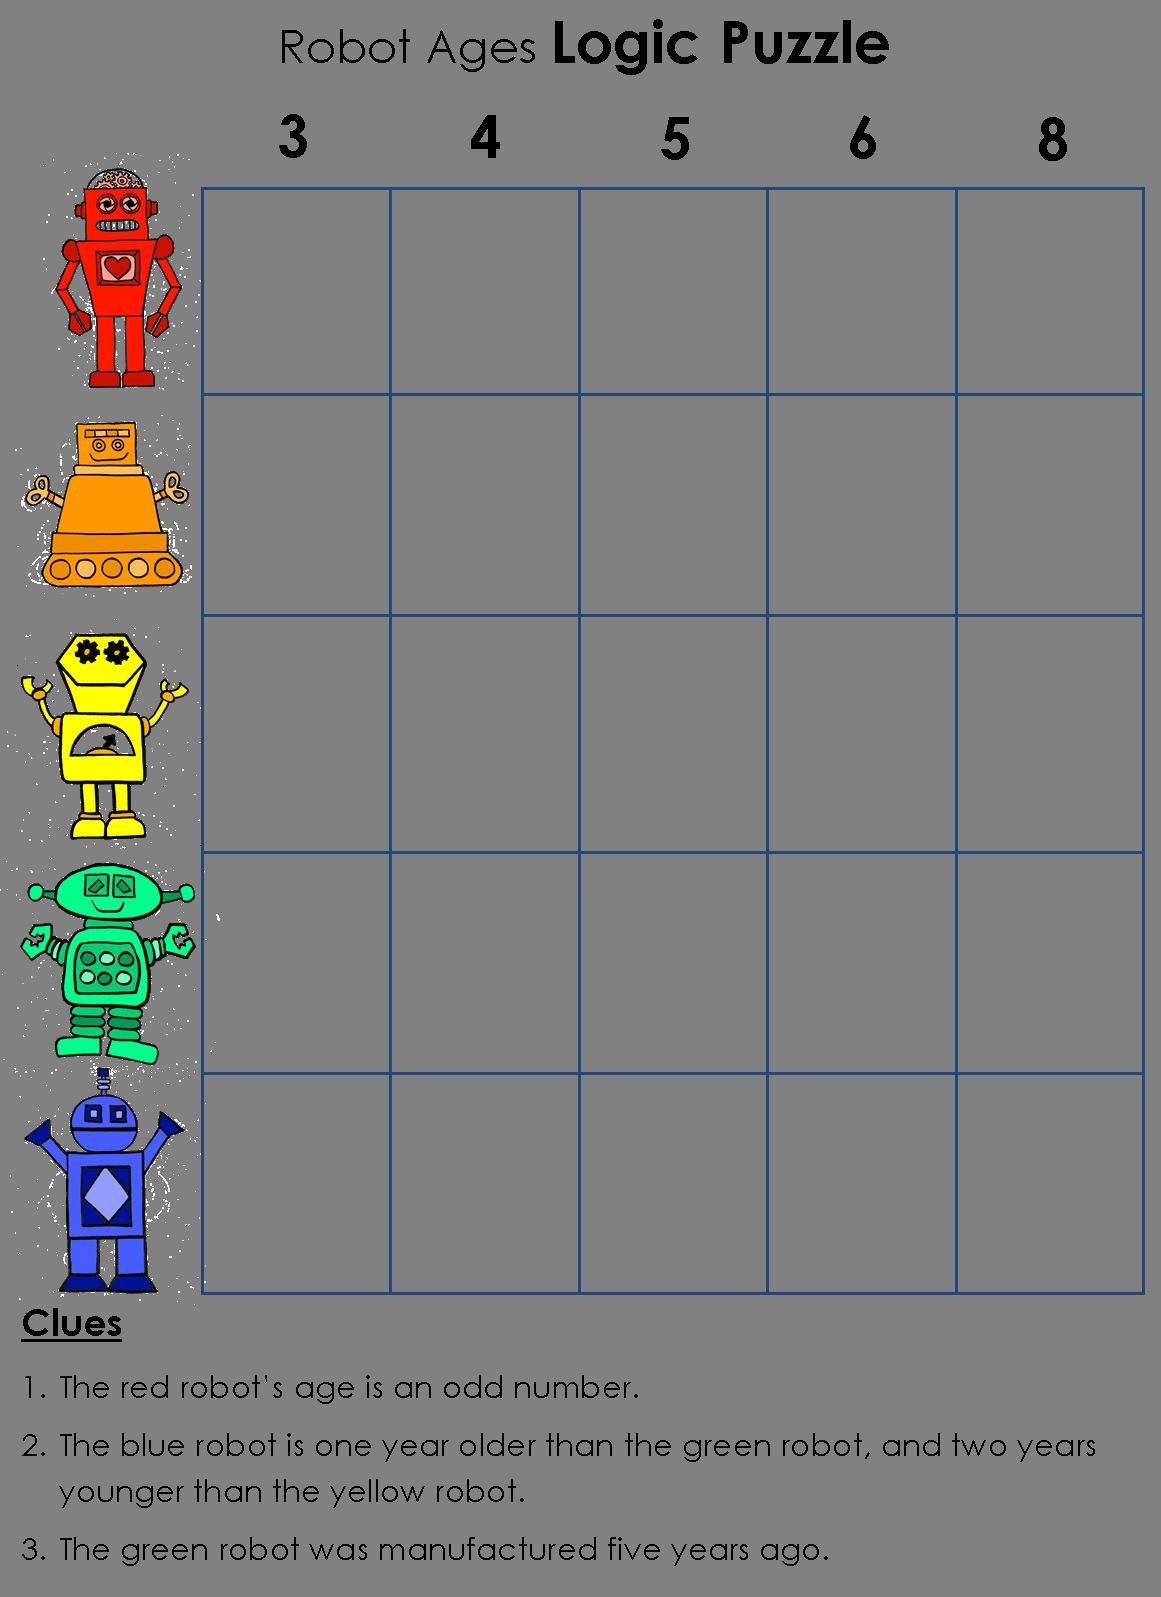 picture download Logic Puzzle Robot